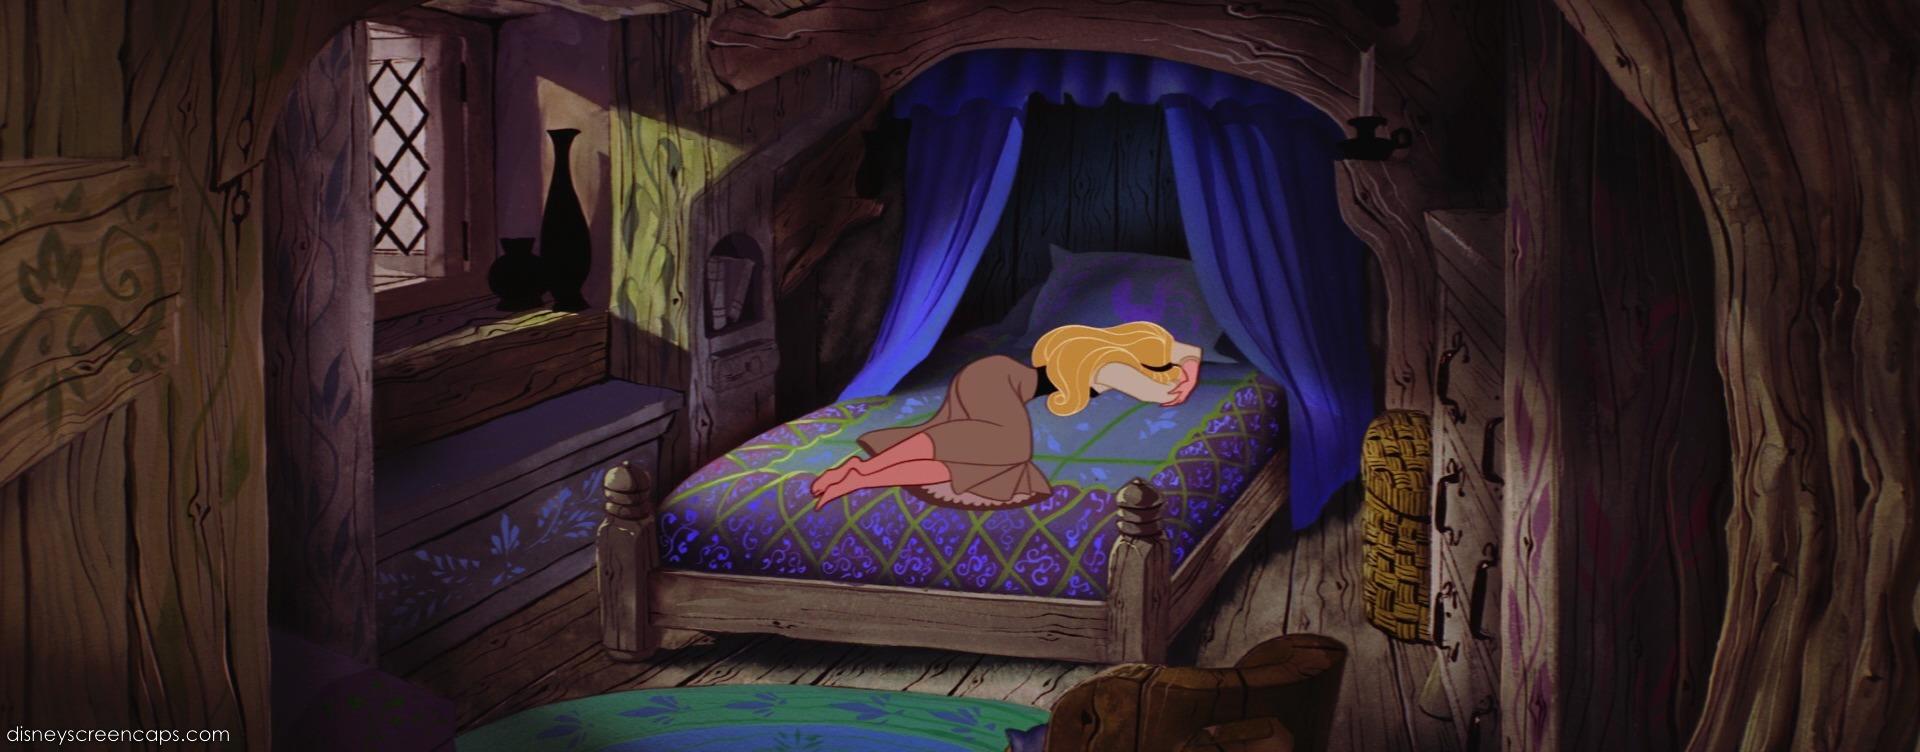 Disney S Sleeping Beauty A Character Analysis Of Princess